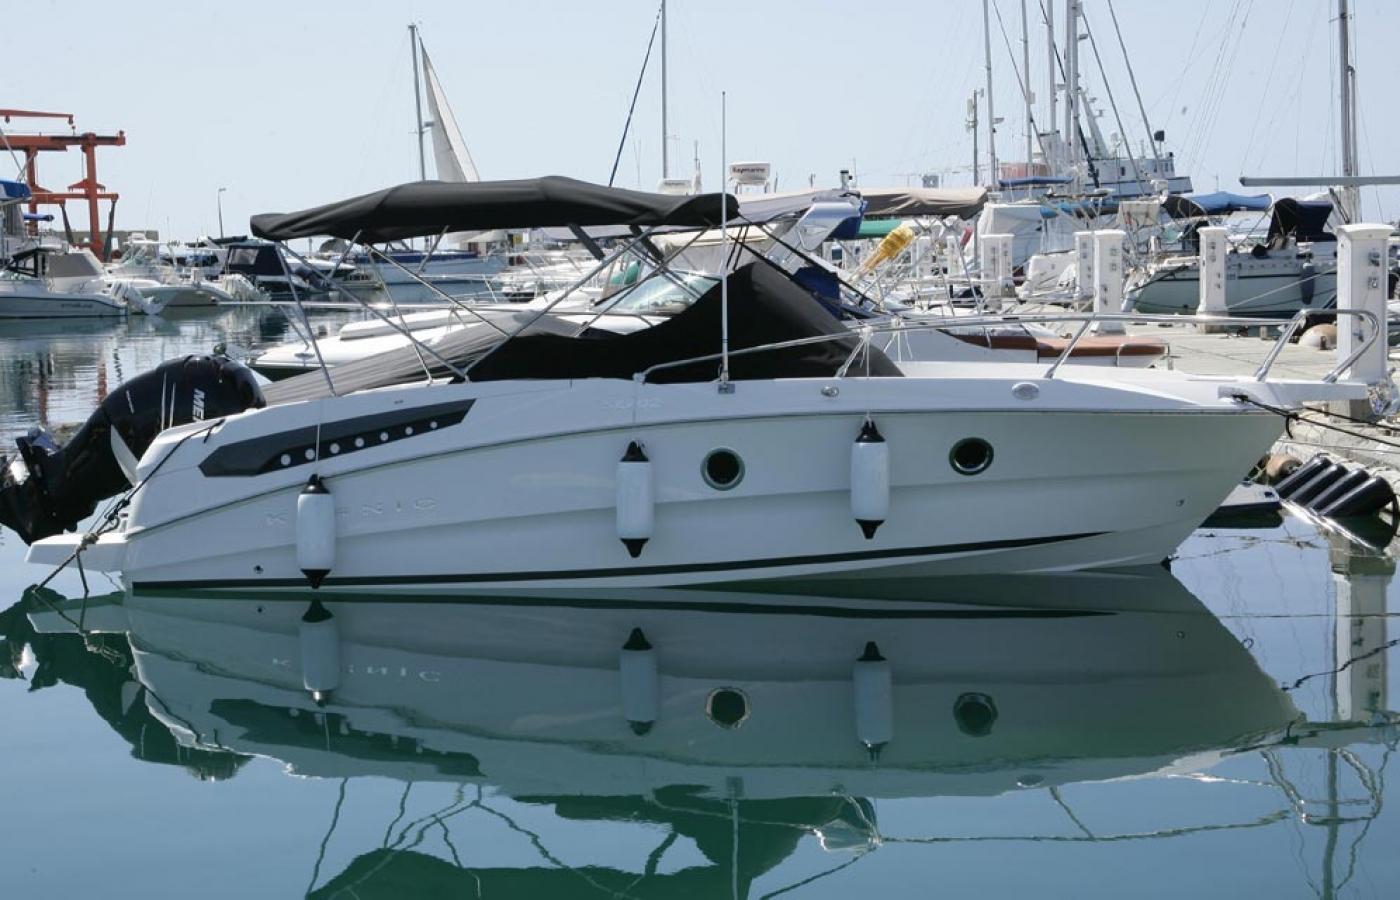 Karnic SL702 at Piso Livadi Port bay